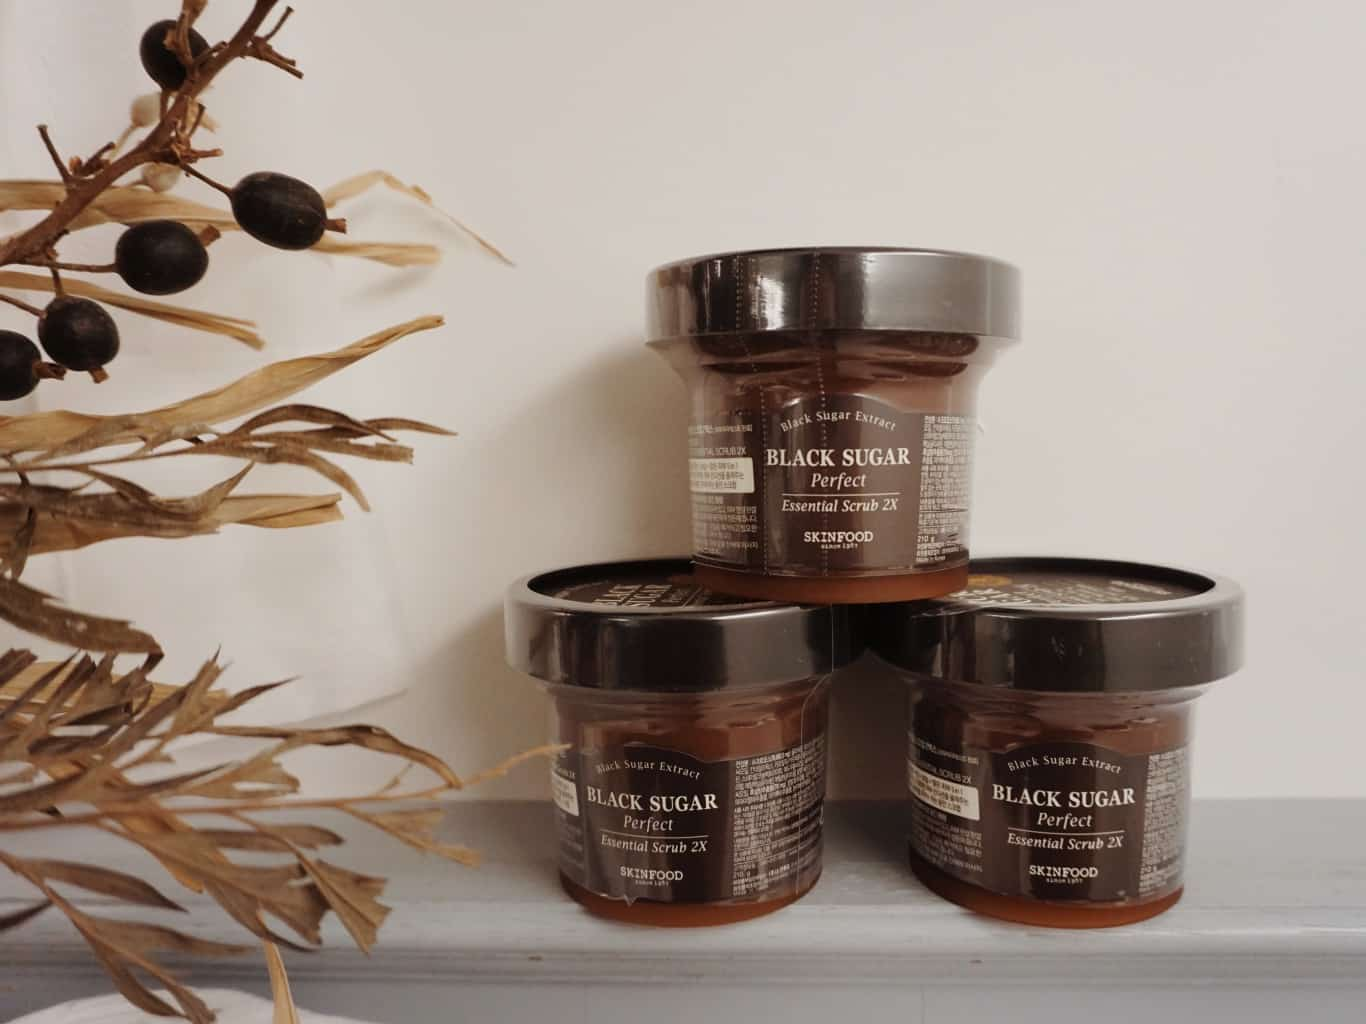 Skinfood-Black-Sugar-Perfect-Essential-Scrub-2X